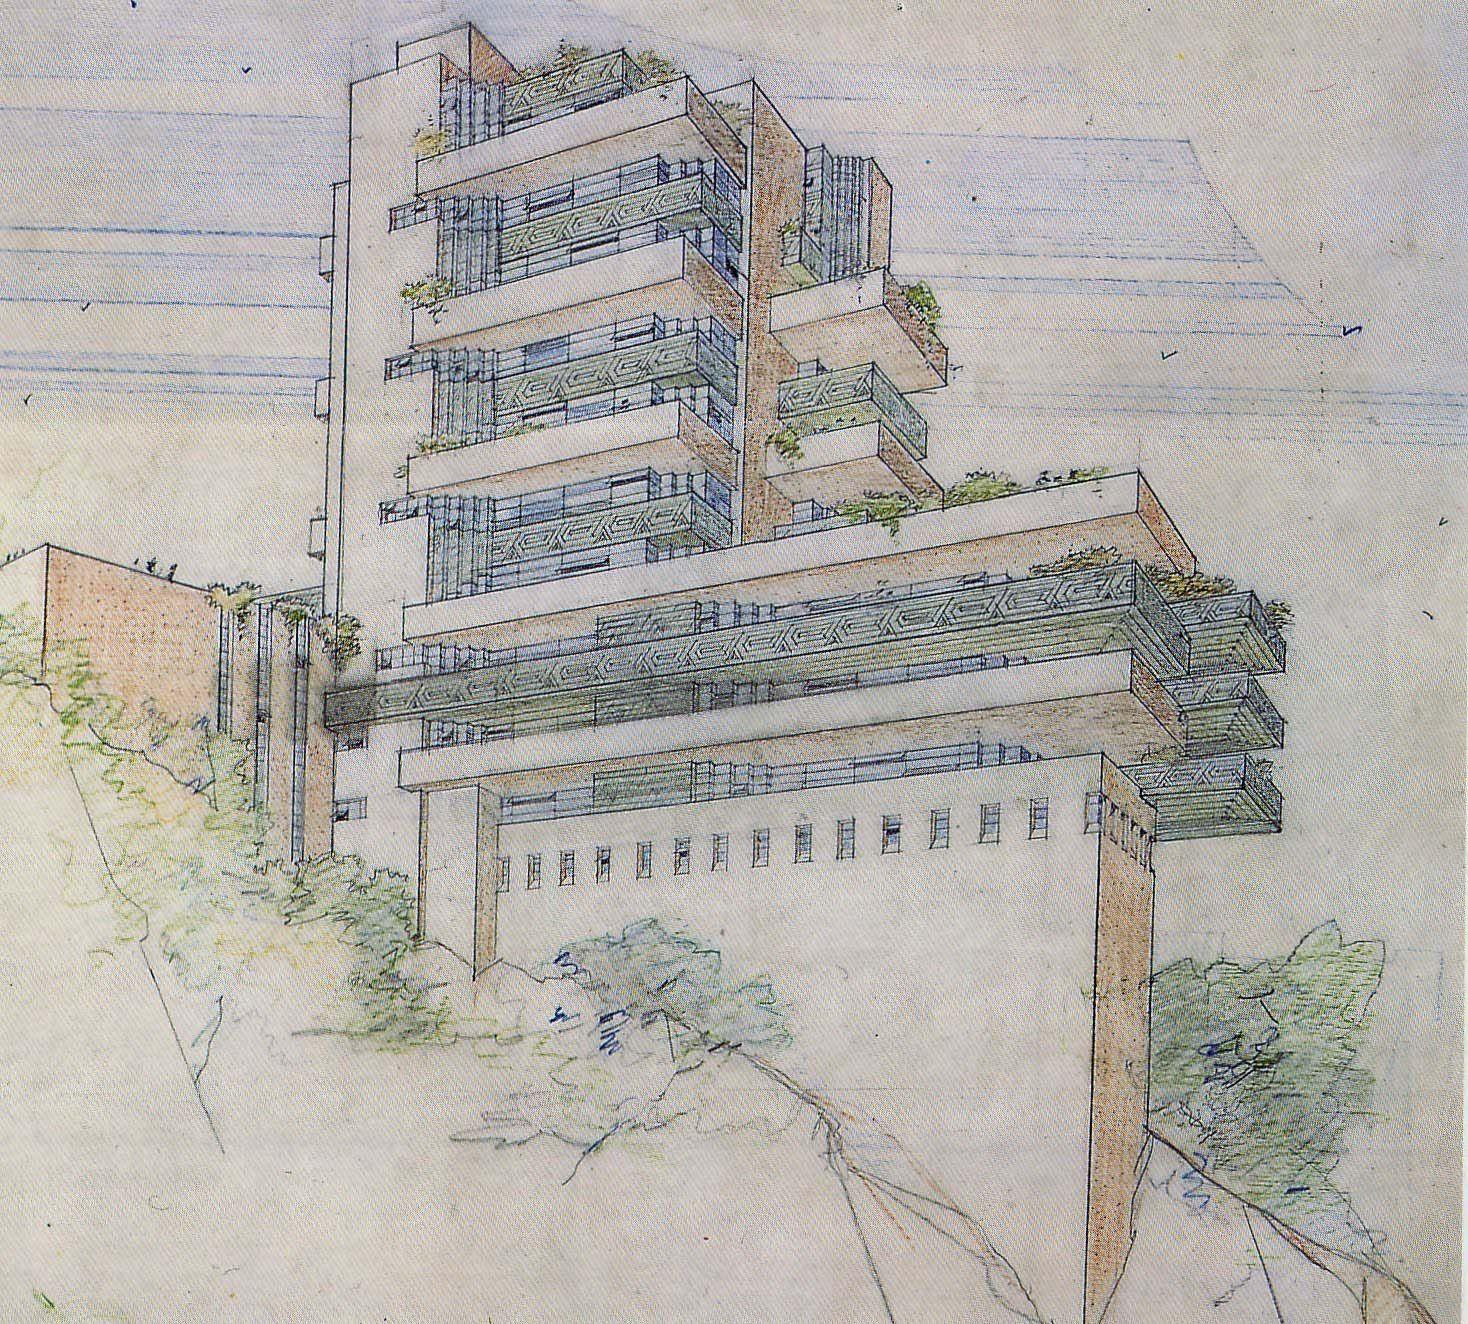 Frank lloyd wright drawings that you enjoyed this series on frank lloyd wright and the drawings